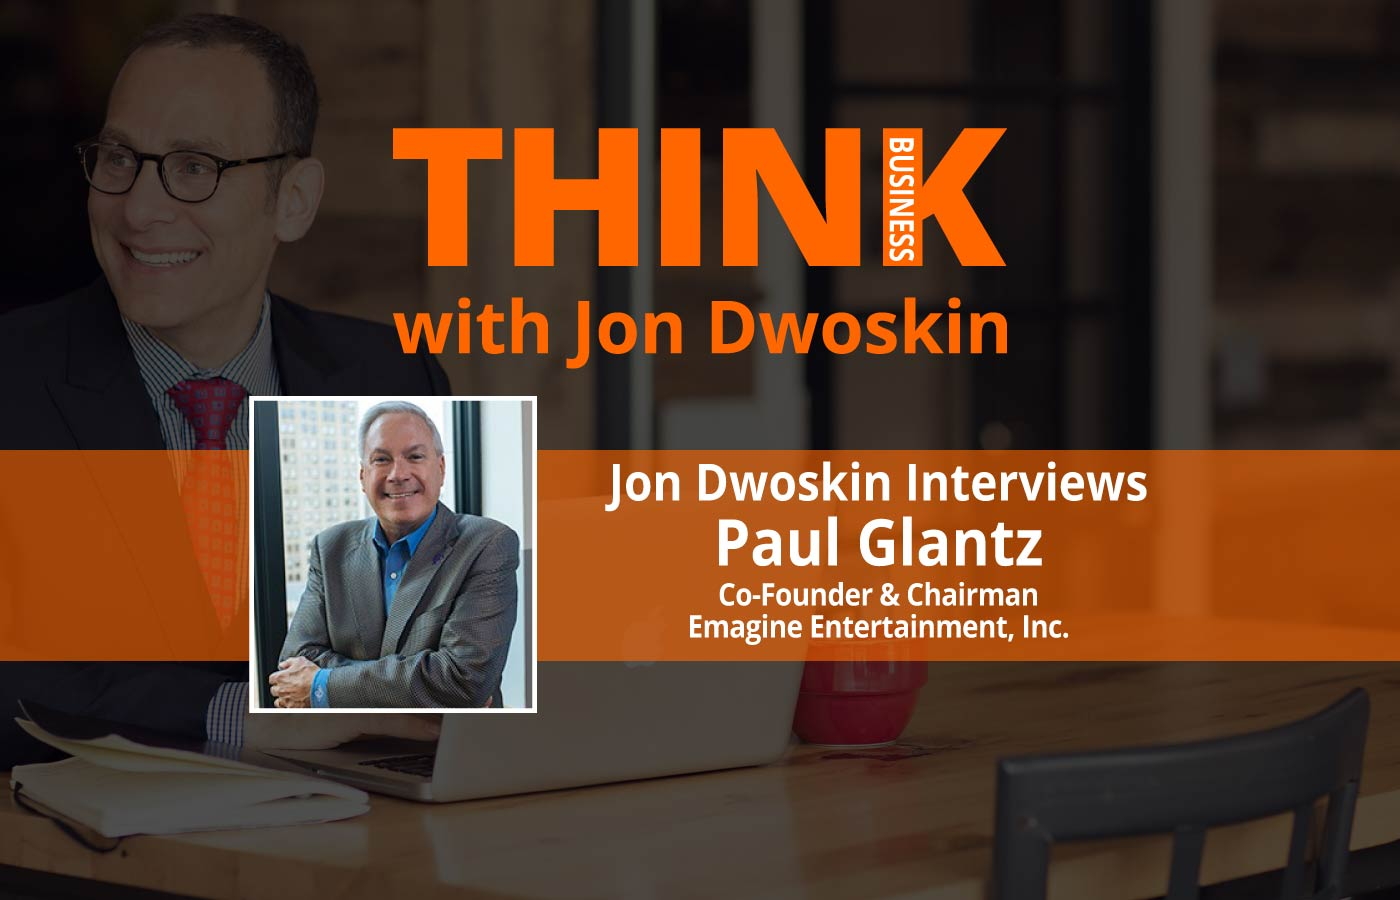 THINK Business Podcast: Jon Dwoskin Interviews Paul Glantz